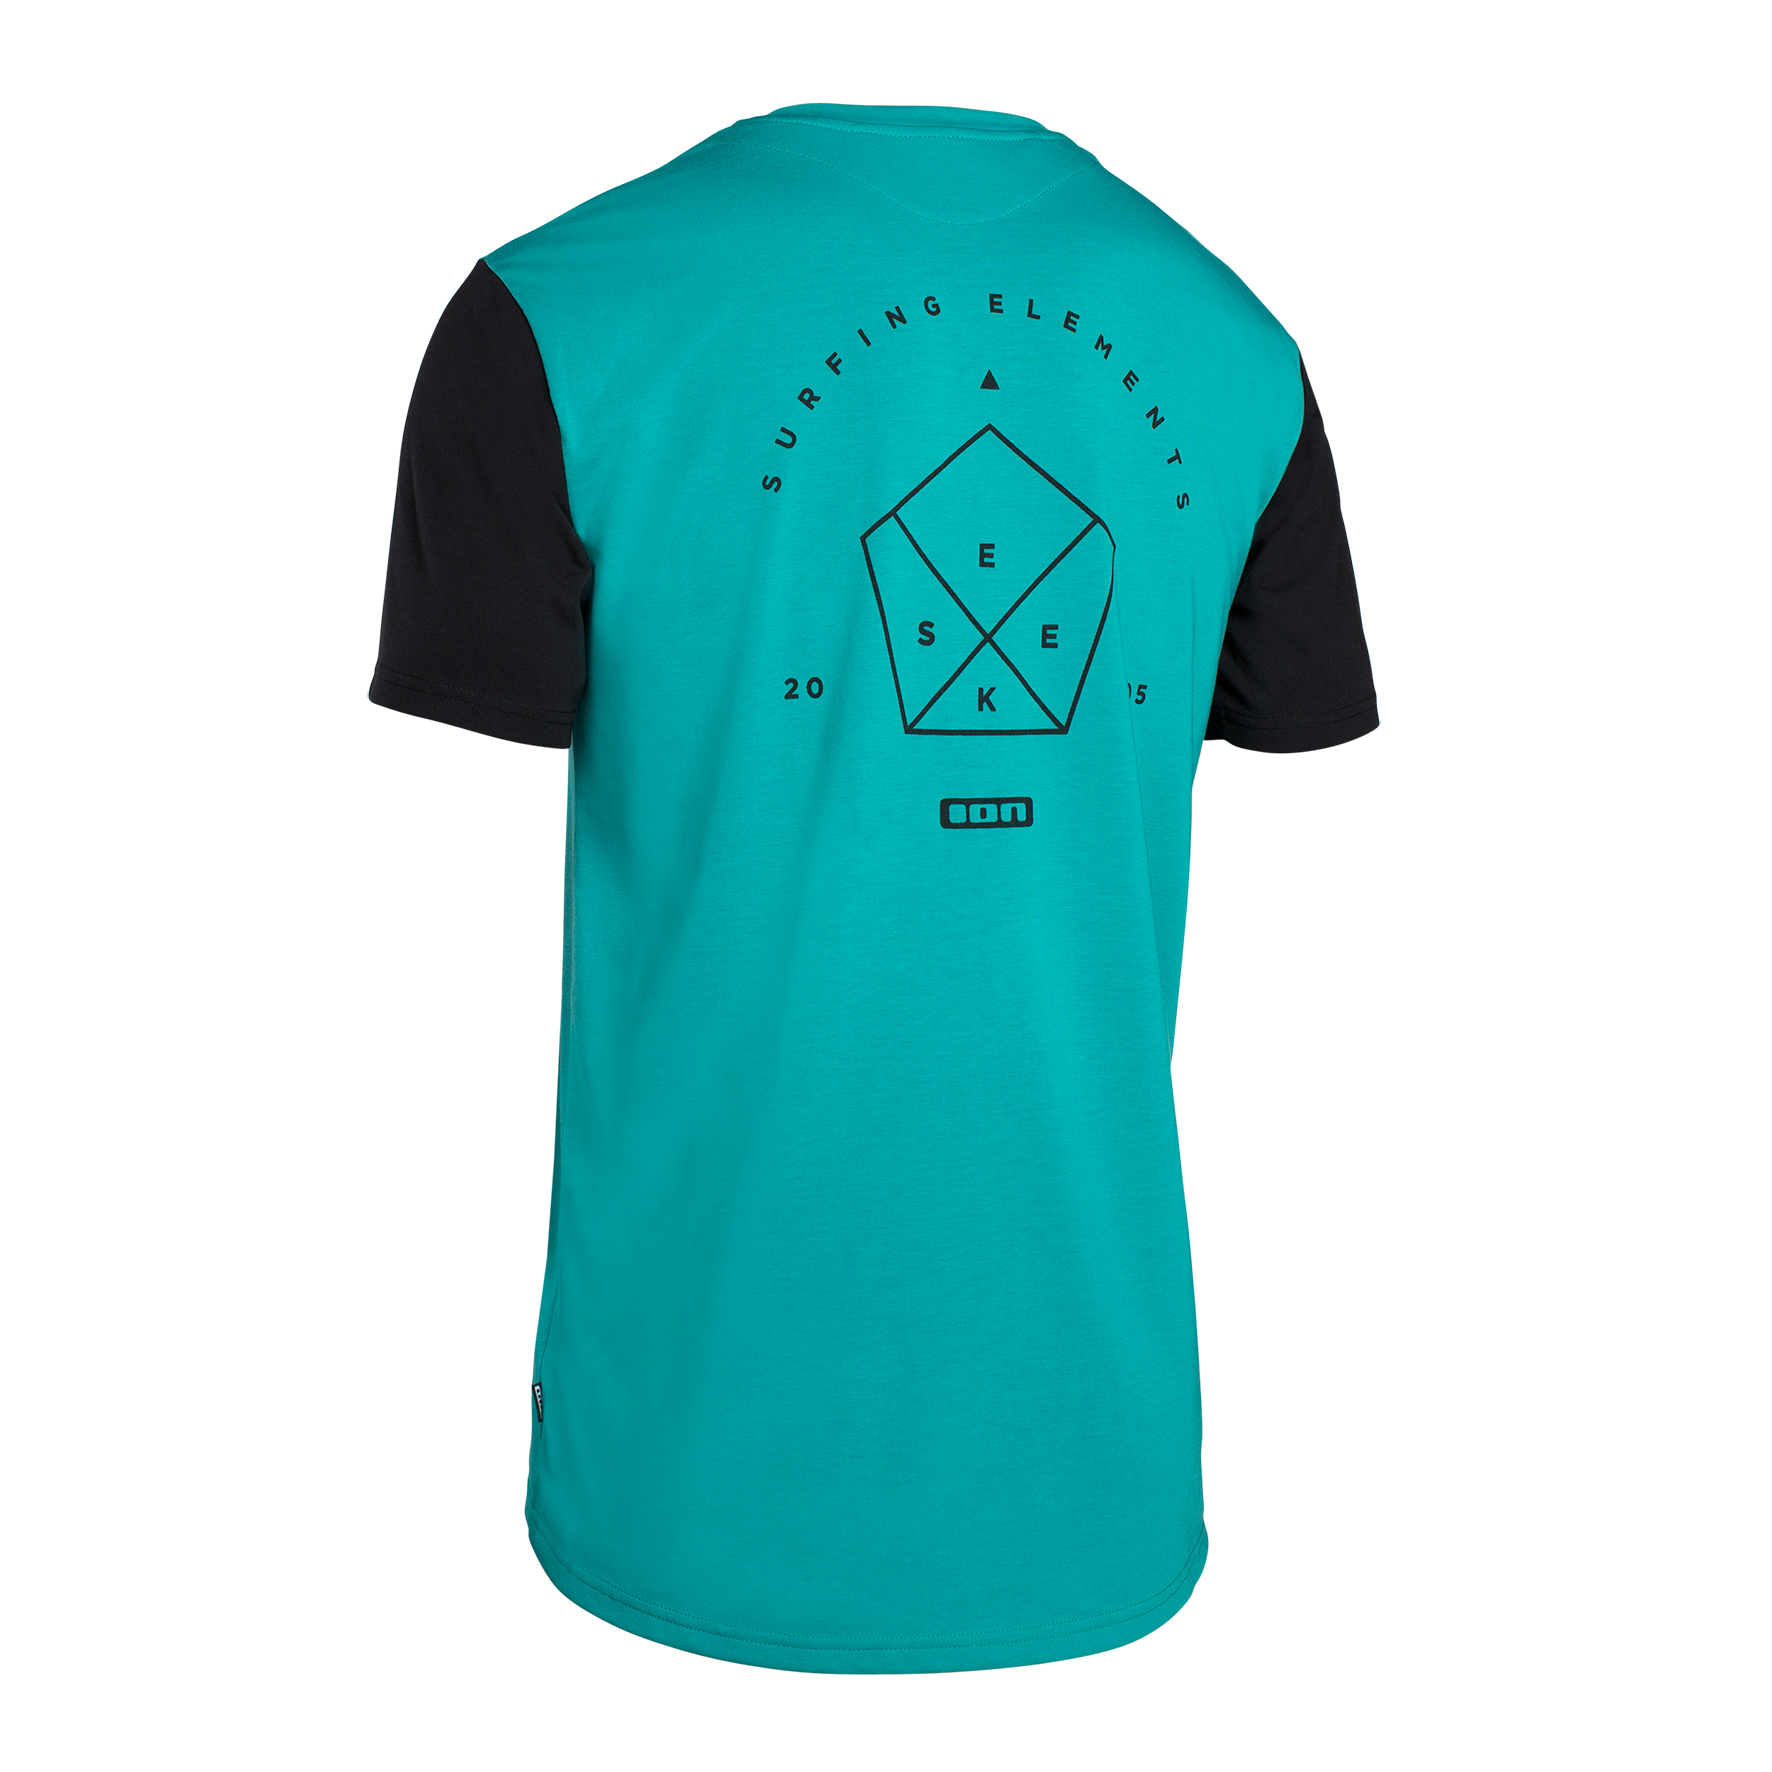 ION Seek_Amp T-Shirt, grün